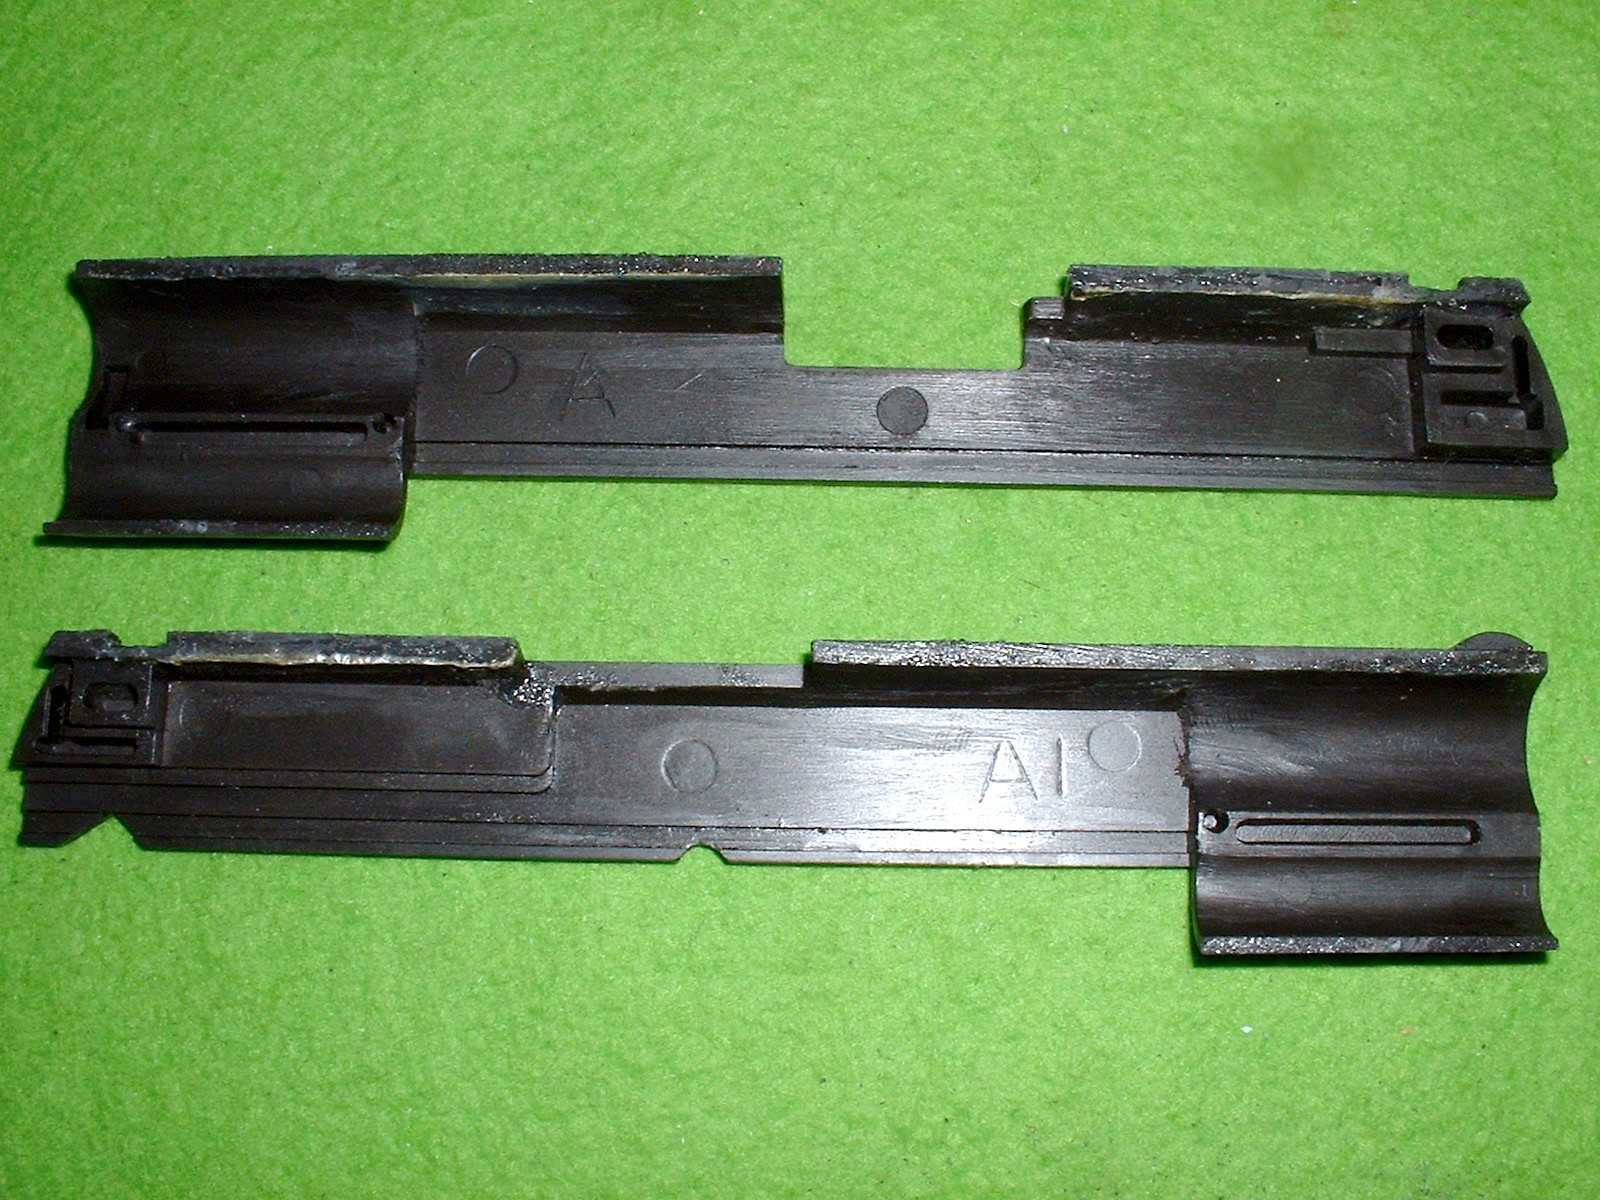 LS ガバメント スライド左側内側 A1の刻印あり Doburoku-TAO.JPG